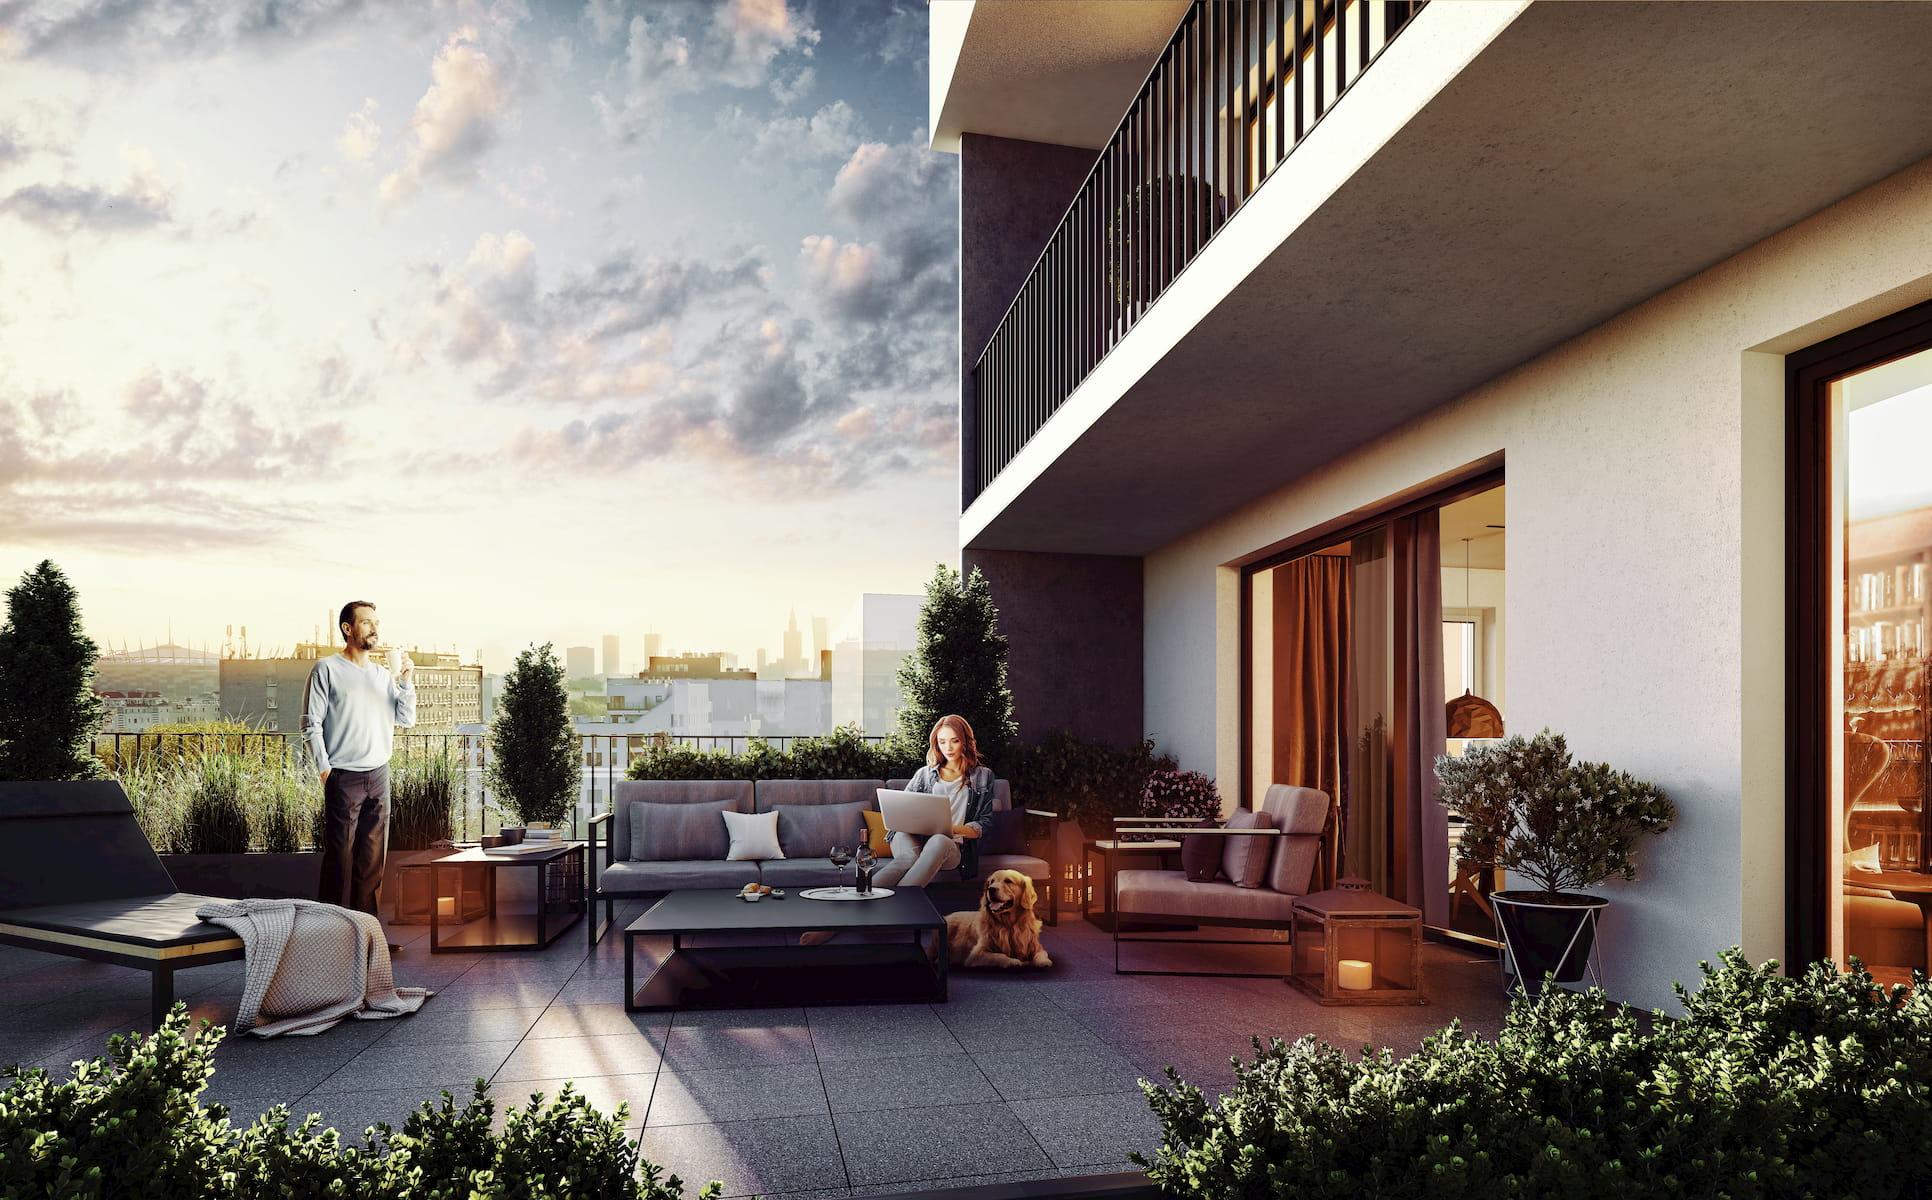 SOHO Warsaw Yareal HRA Architekci 2019 terrace view